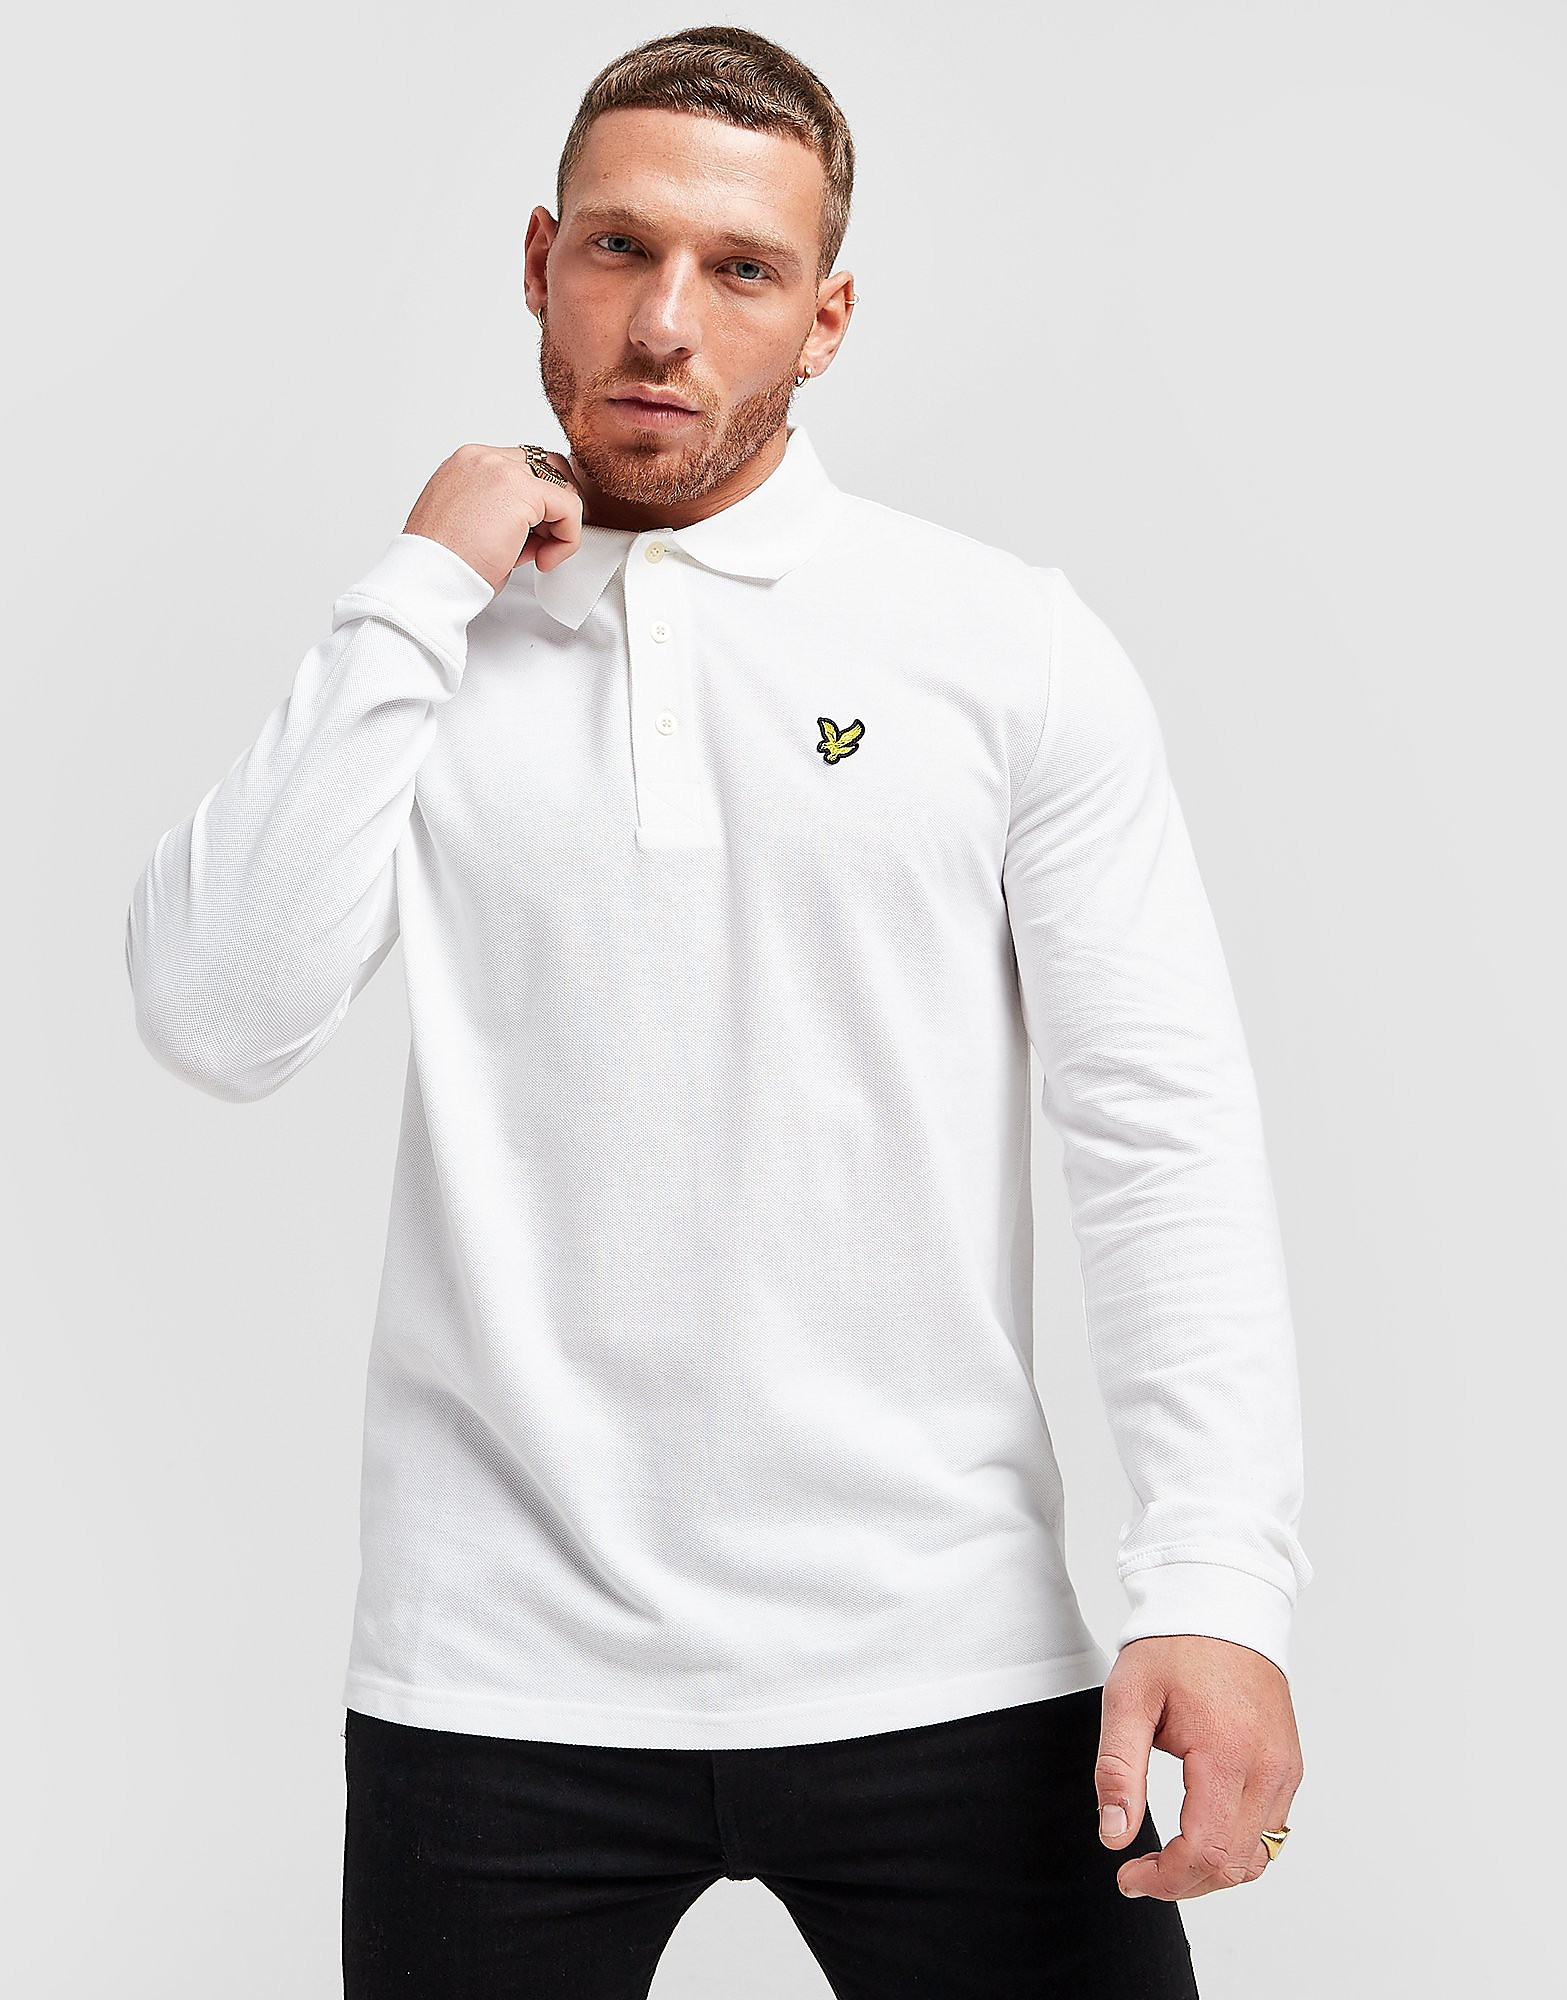 Lyle & Scott Long Sleeve Core Polo Shirt Heren - Wit - Heren